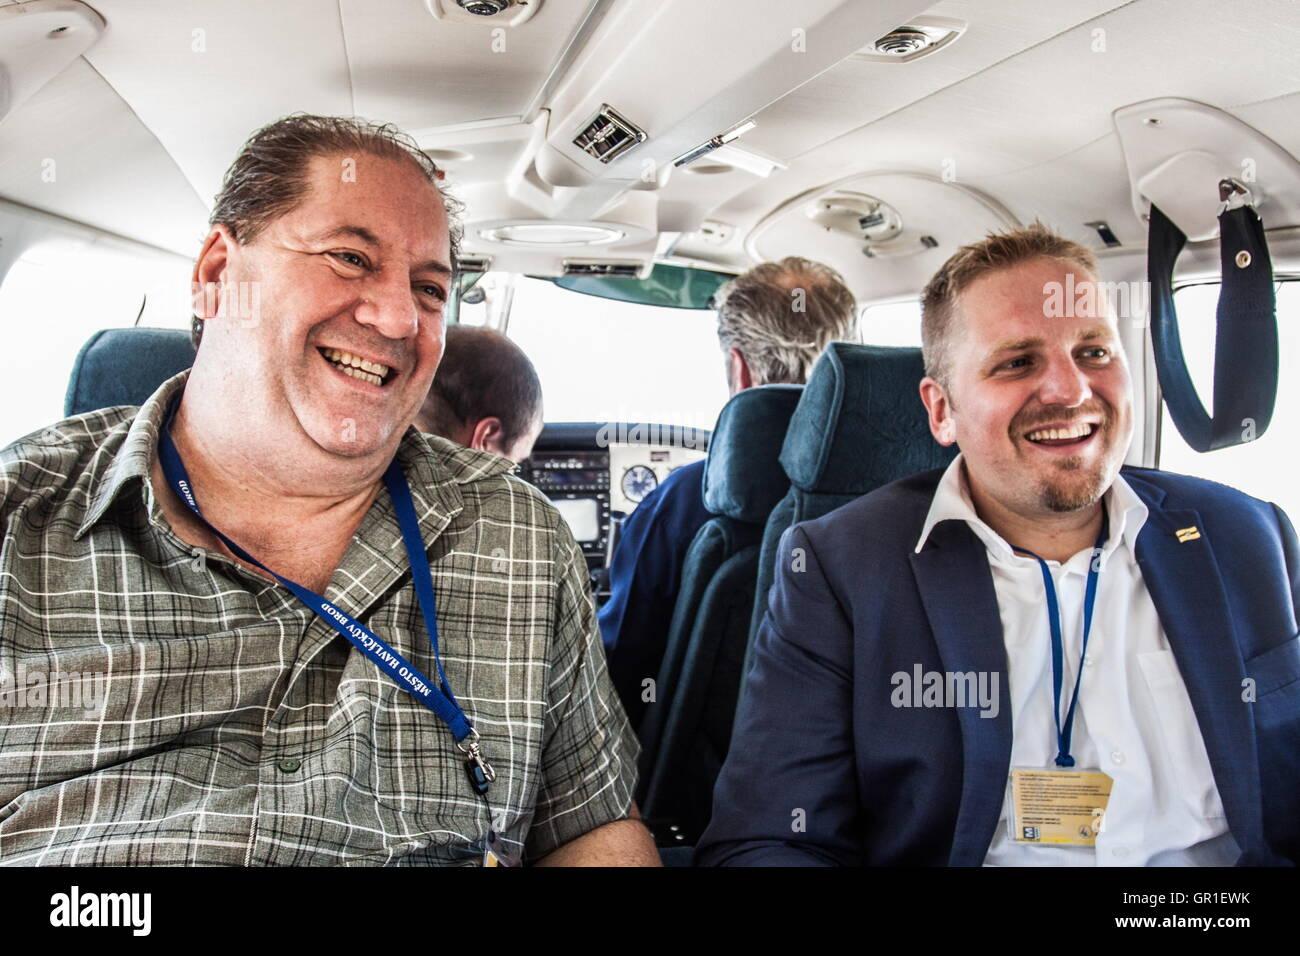 Aug 28, 2016 - Novi Sad, Serbia - Chris Principe (global banking principal on the left) and VIT JEDLICKA (president Stock Photo